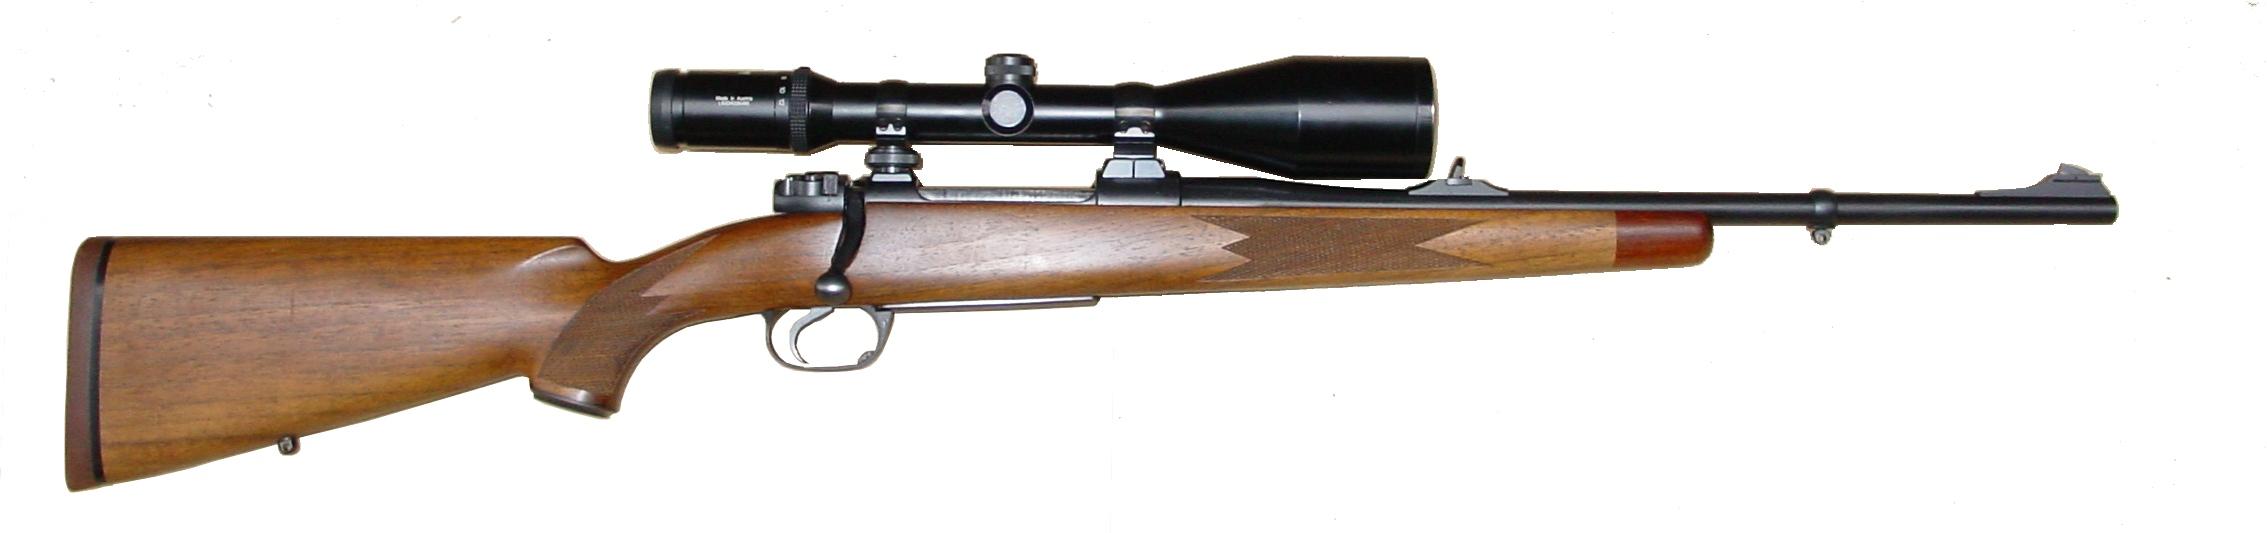 Gun Shot clipart hunting rifle Rifles rifles hunting Pinterest hunting